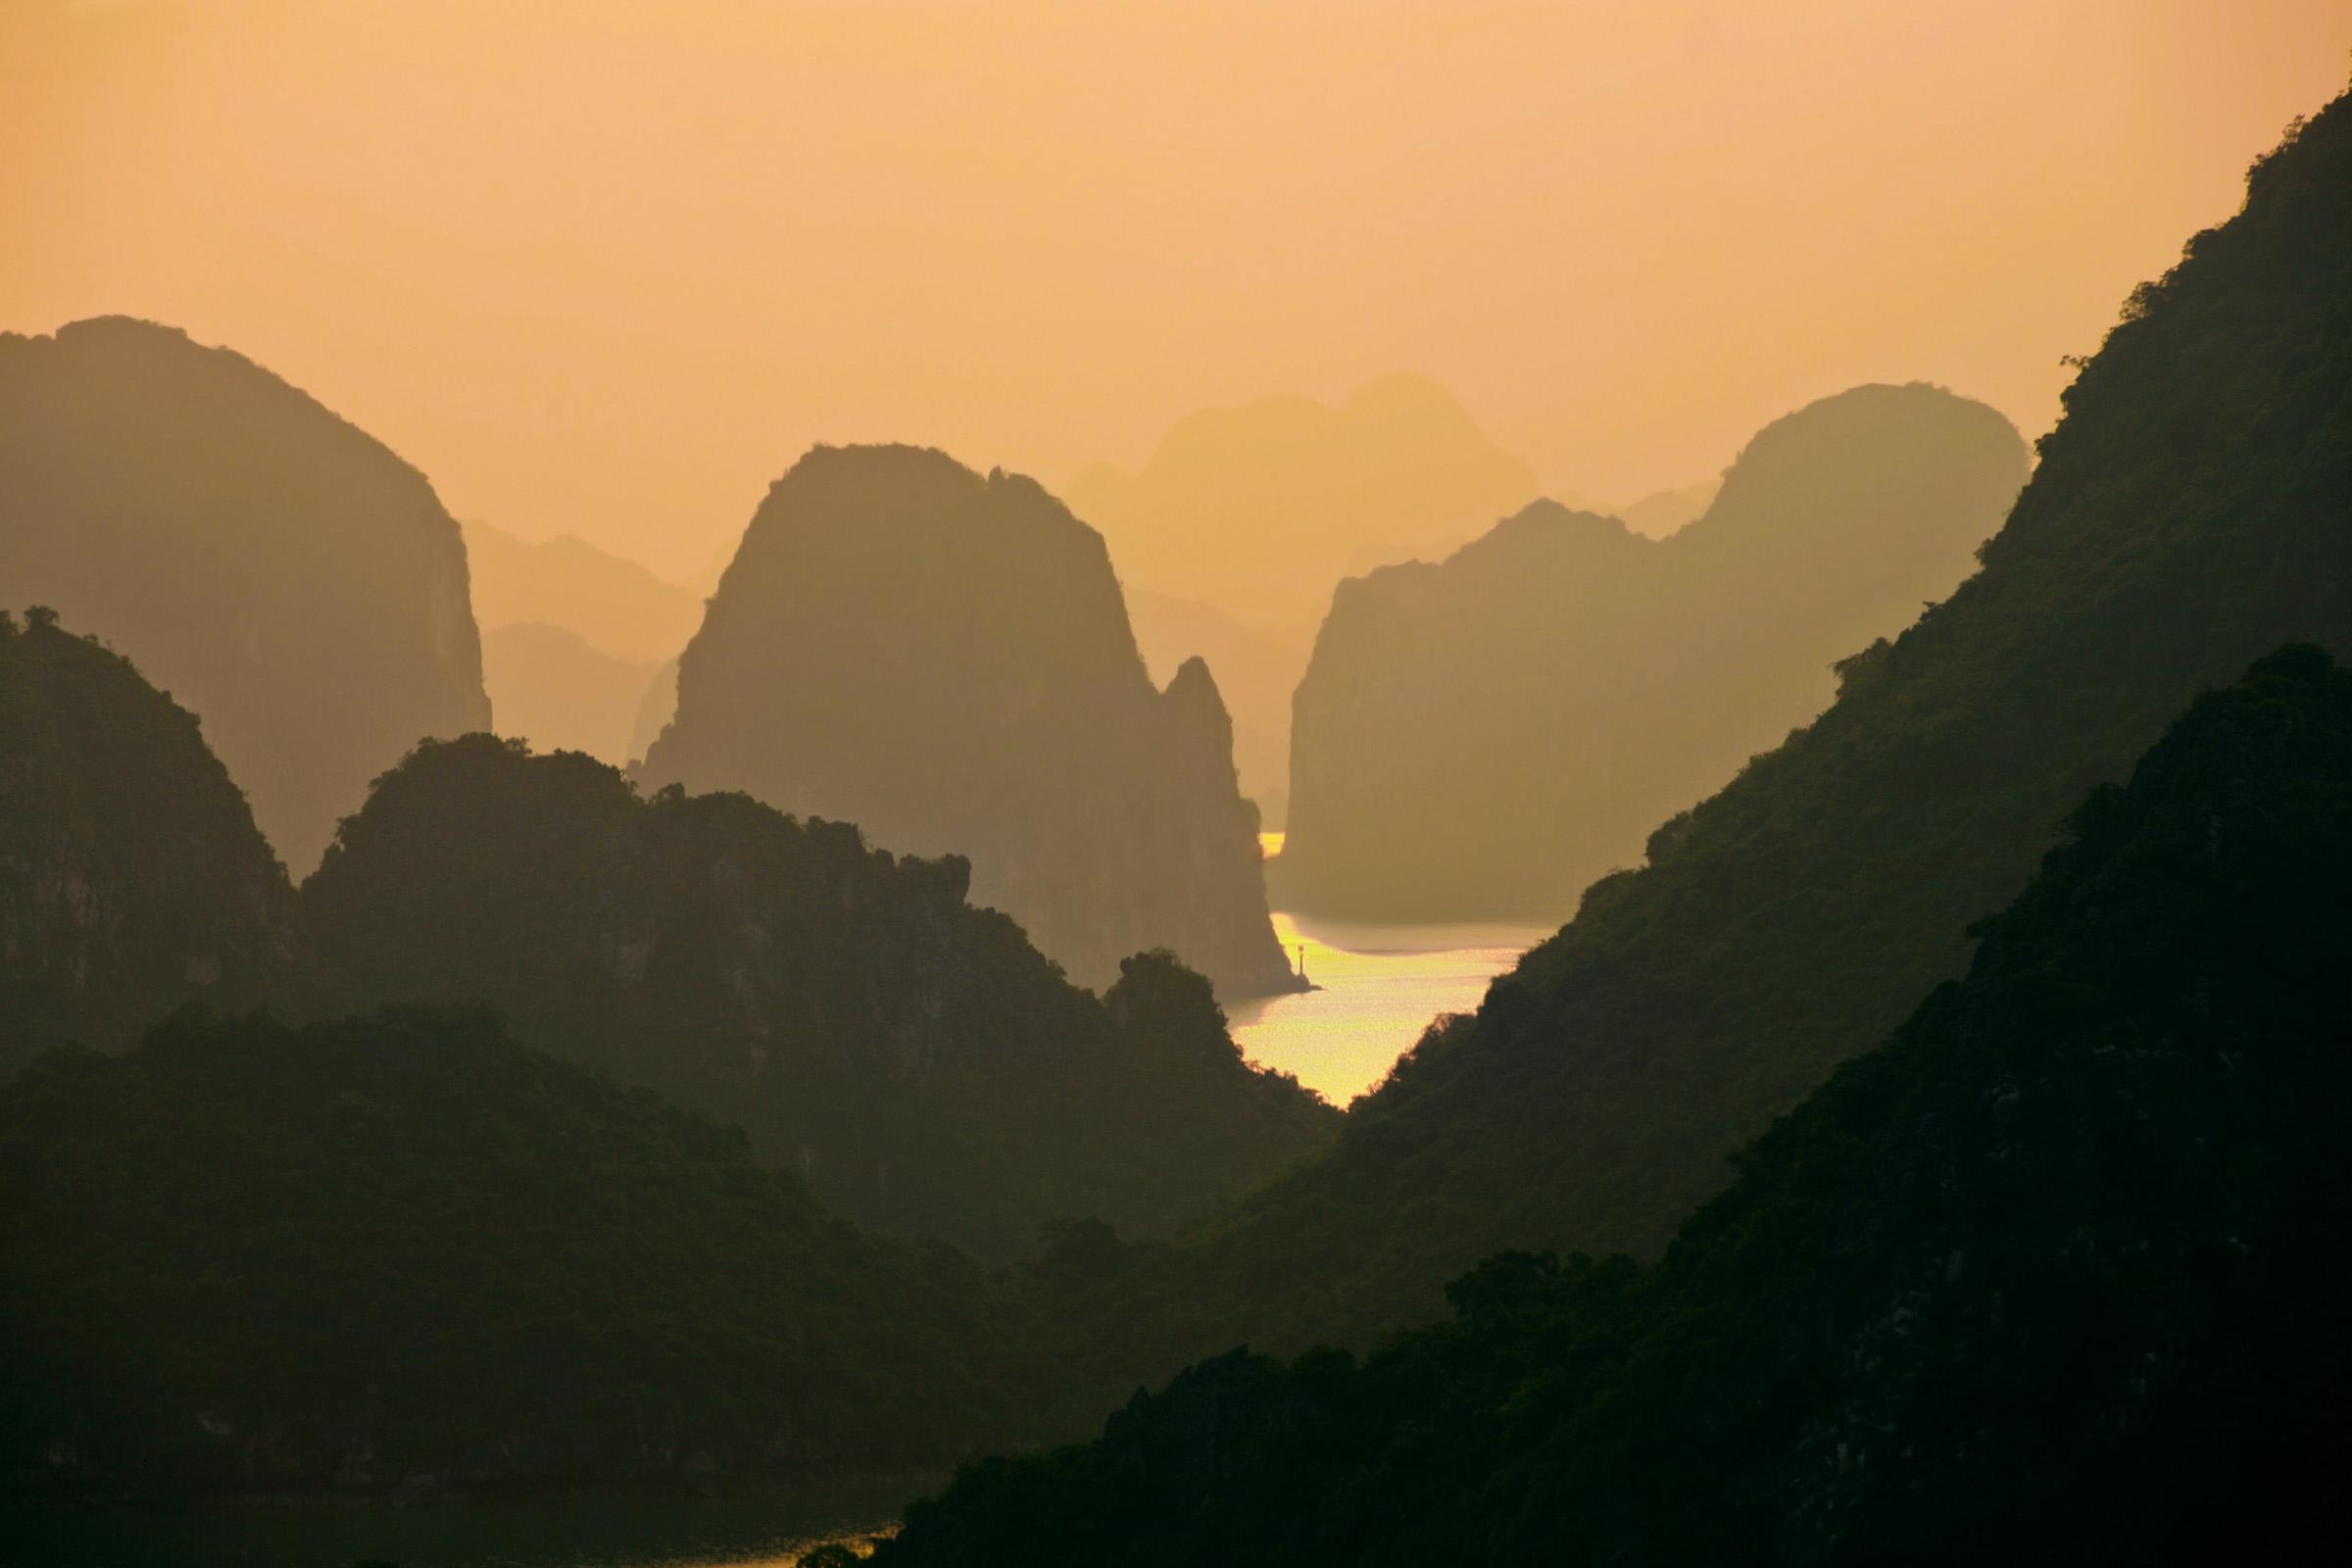 Ha Long Bay, VIetnam - by Aftab Uzzaman